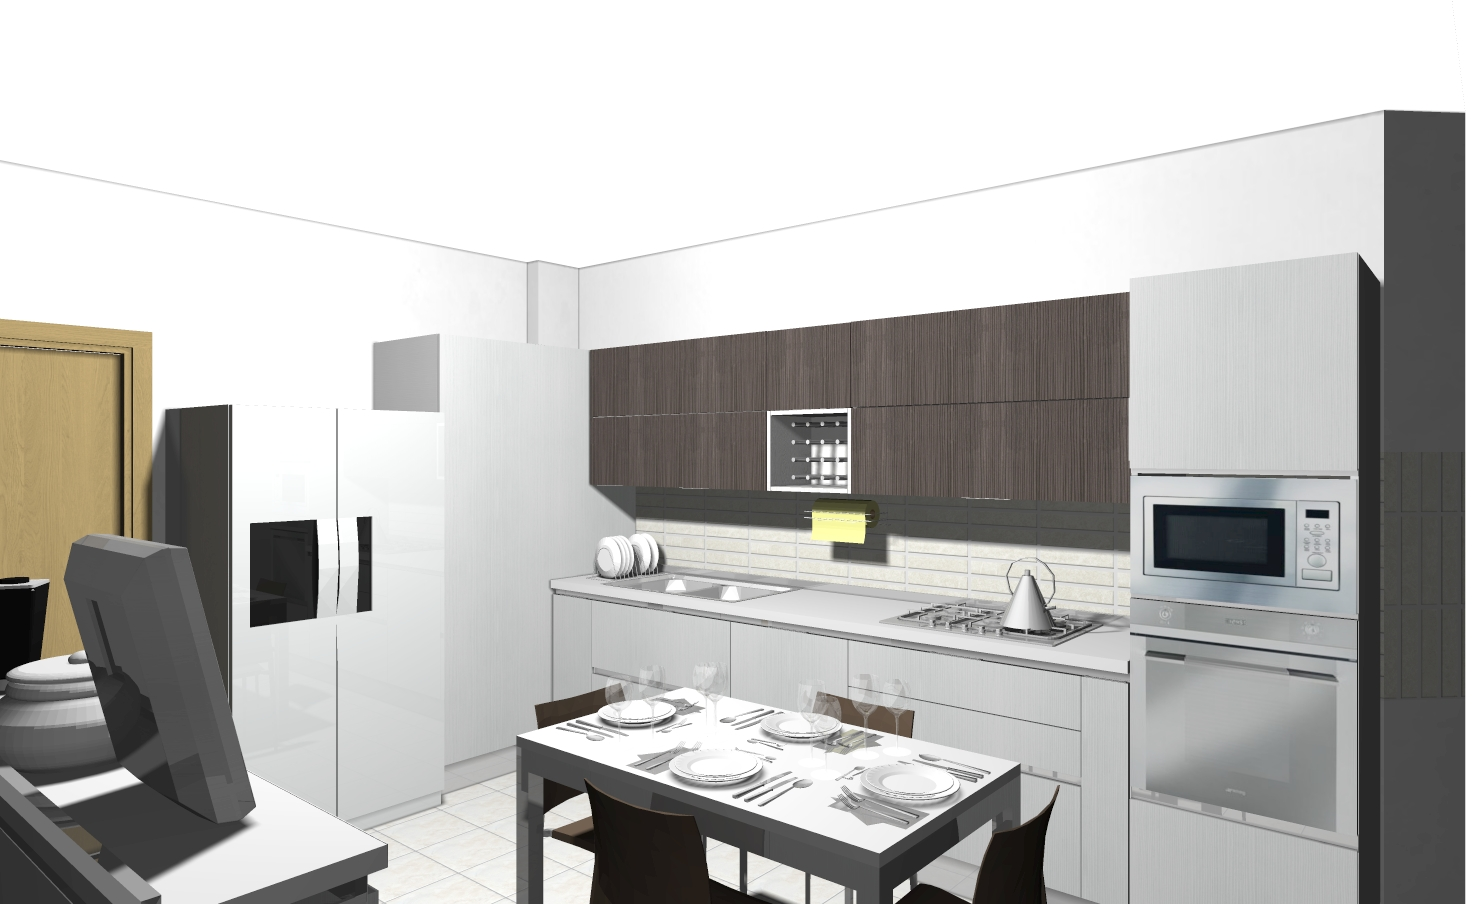 Pattumiera Cucina Veneta | Cucina Veneta Milano Le Migliori Idee Di ...